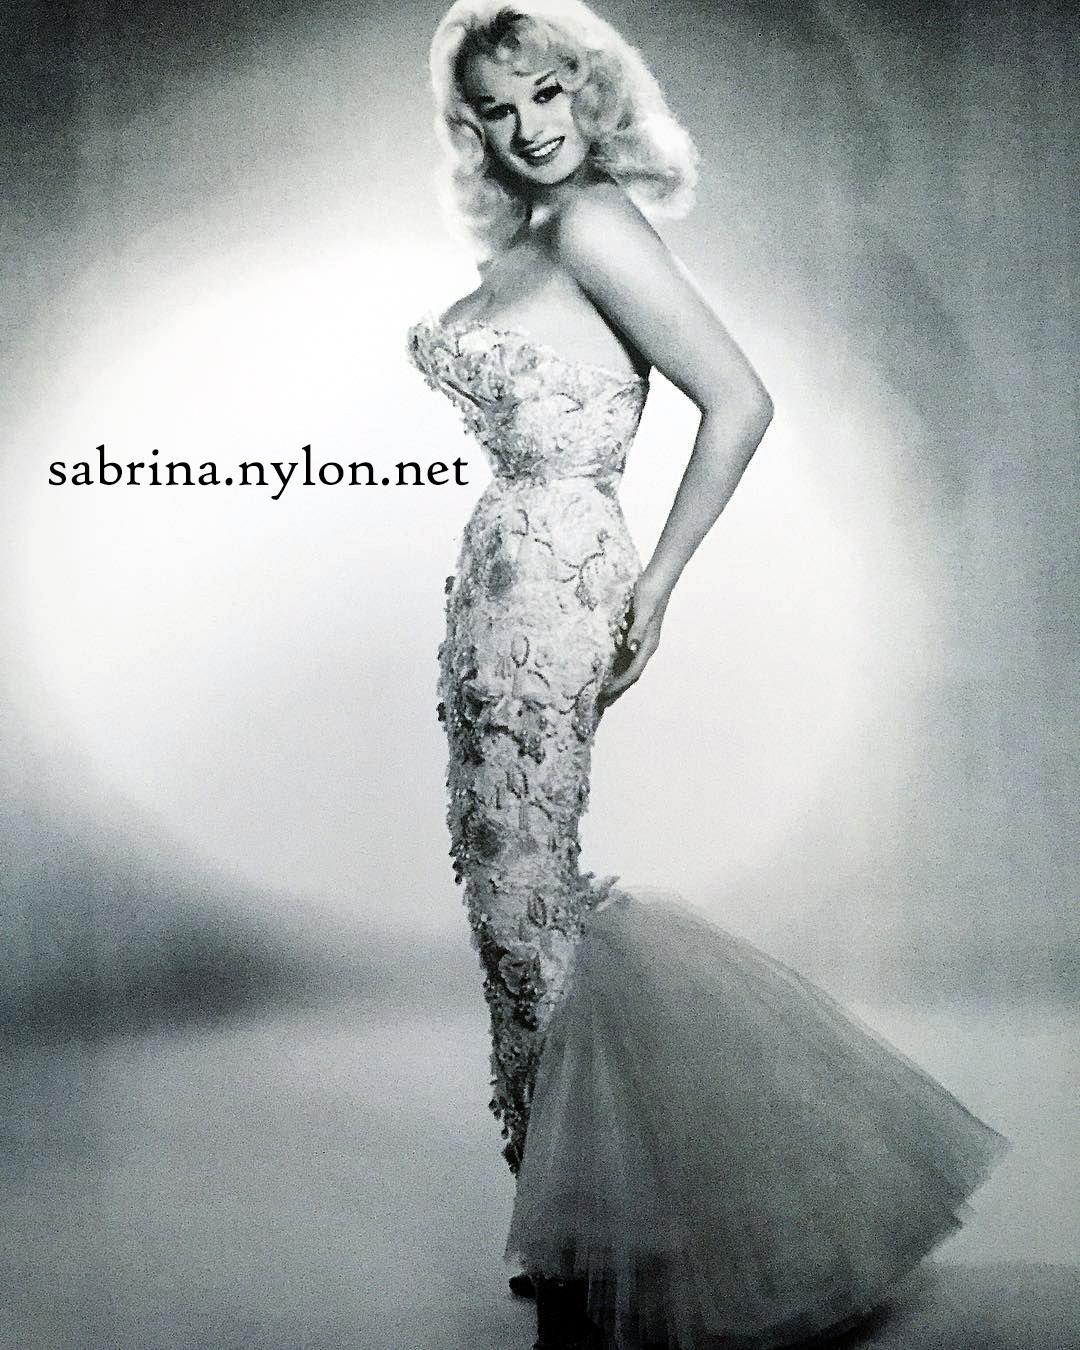 Sabrina News